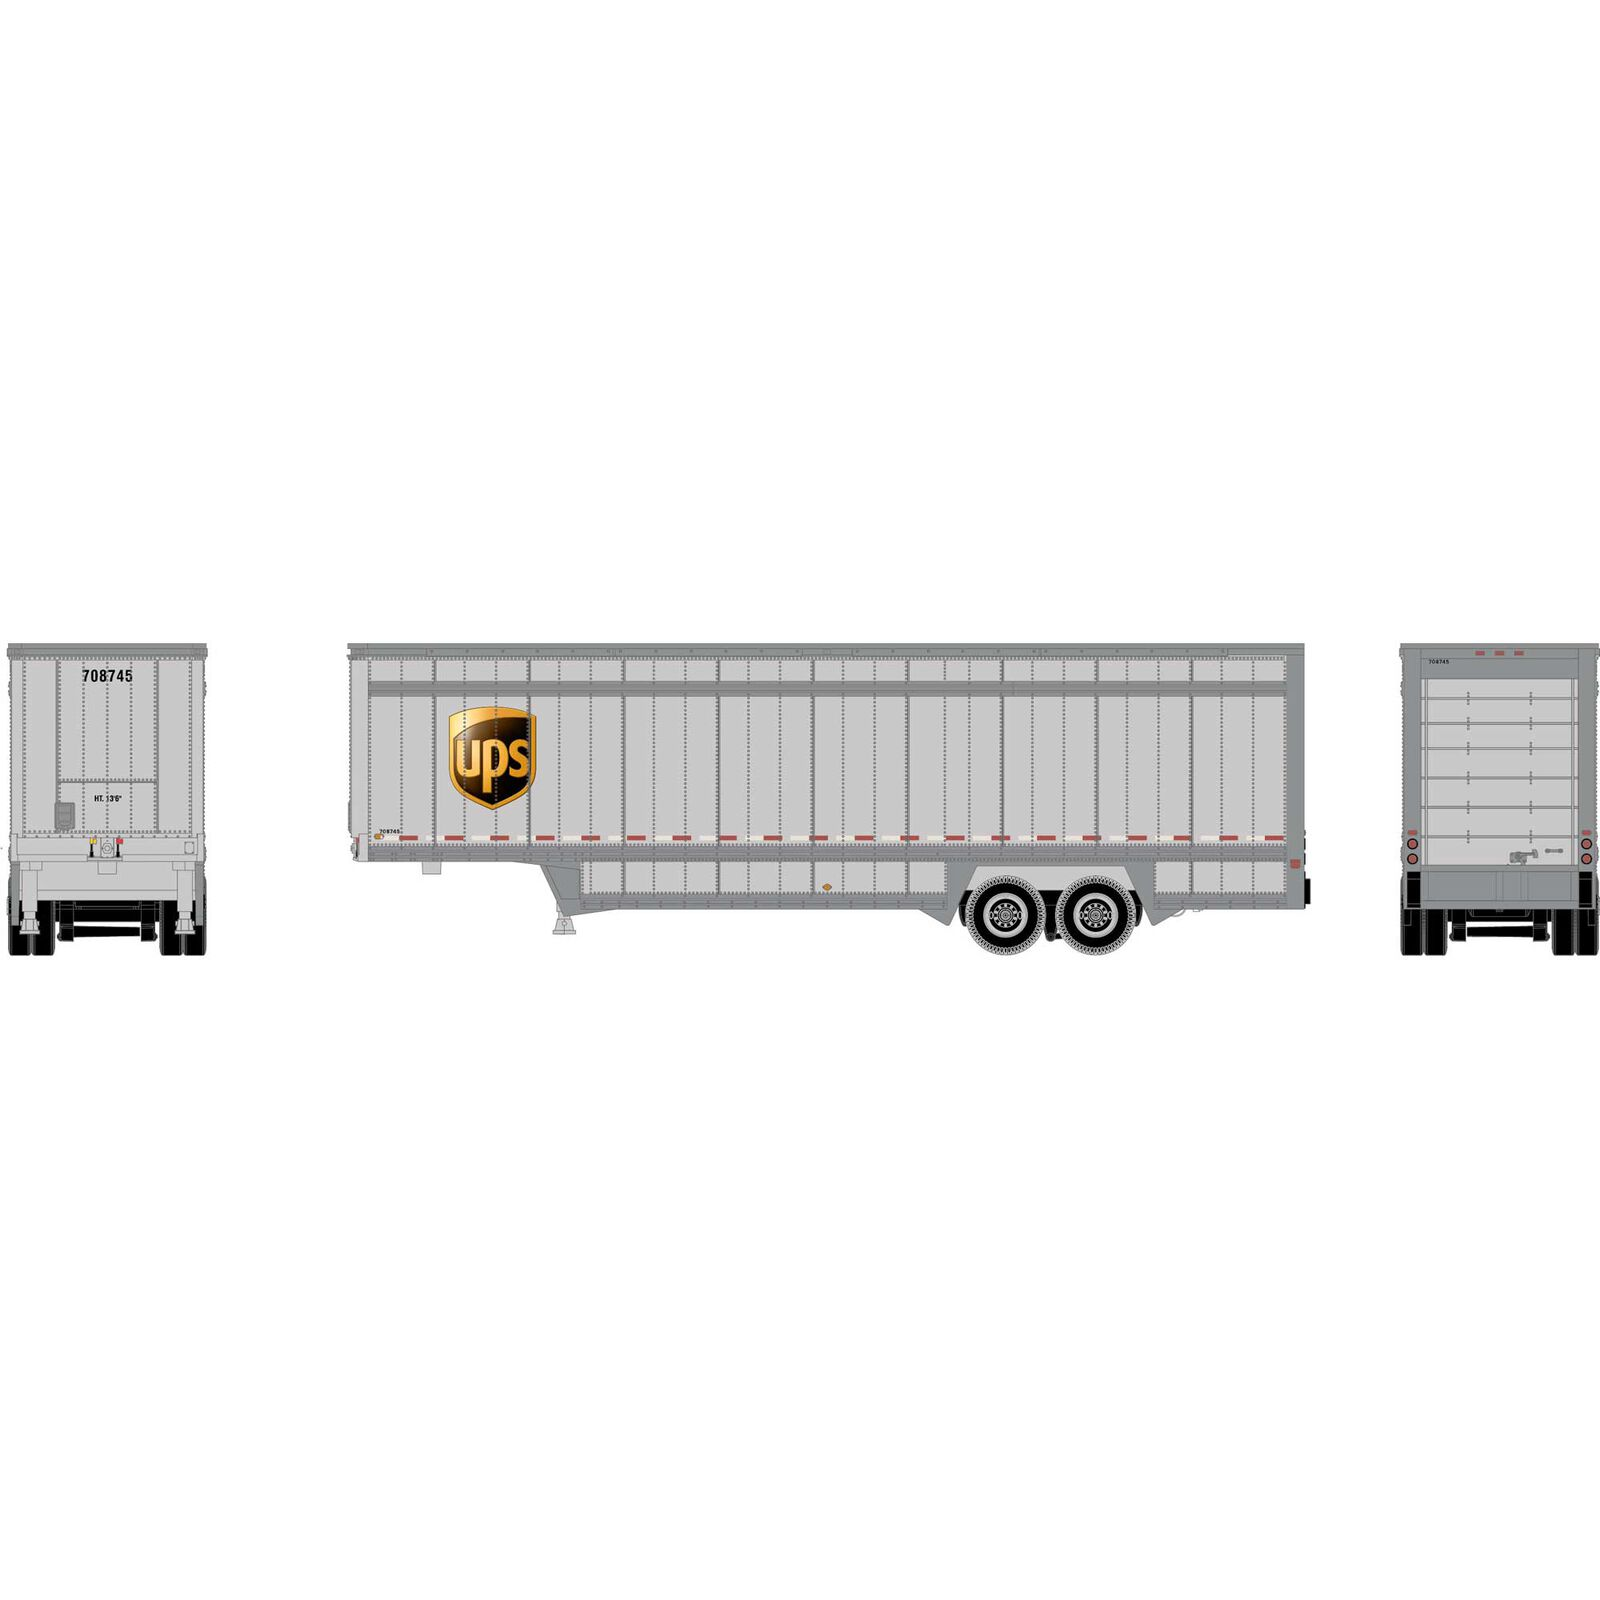 N 40' Drop Sill Parcel Trailer, UPS/Logo #708745